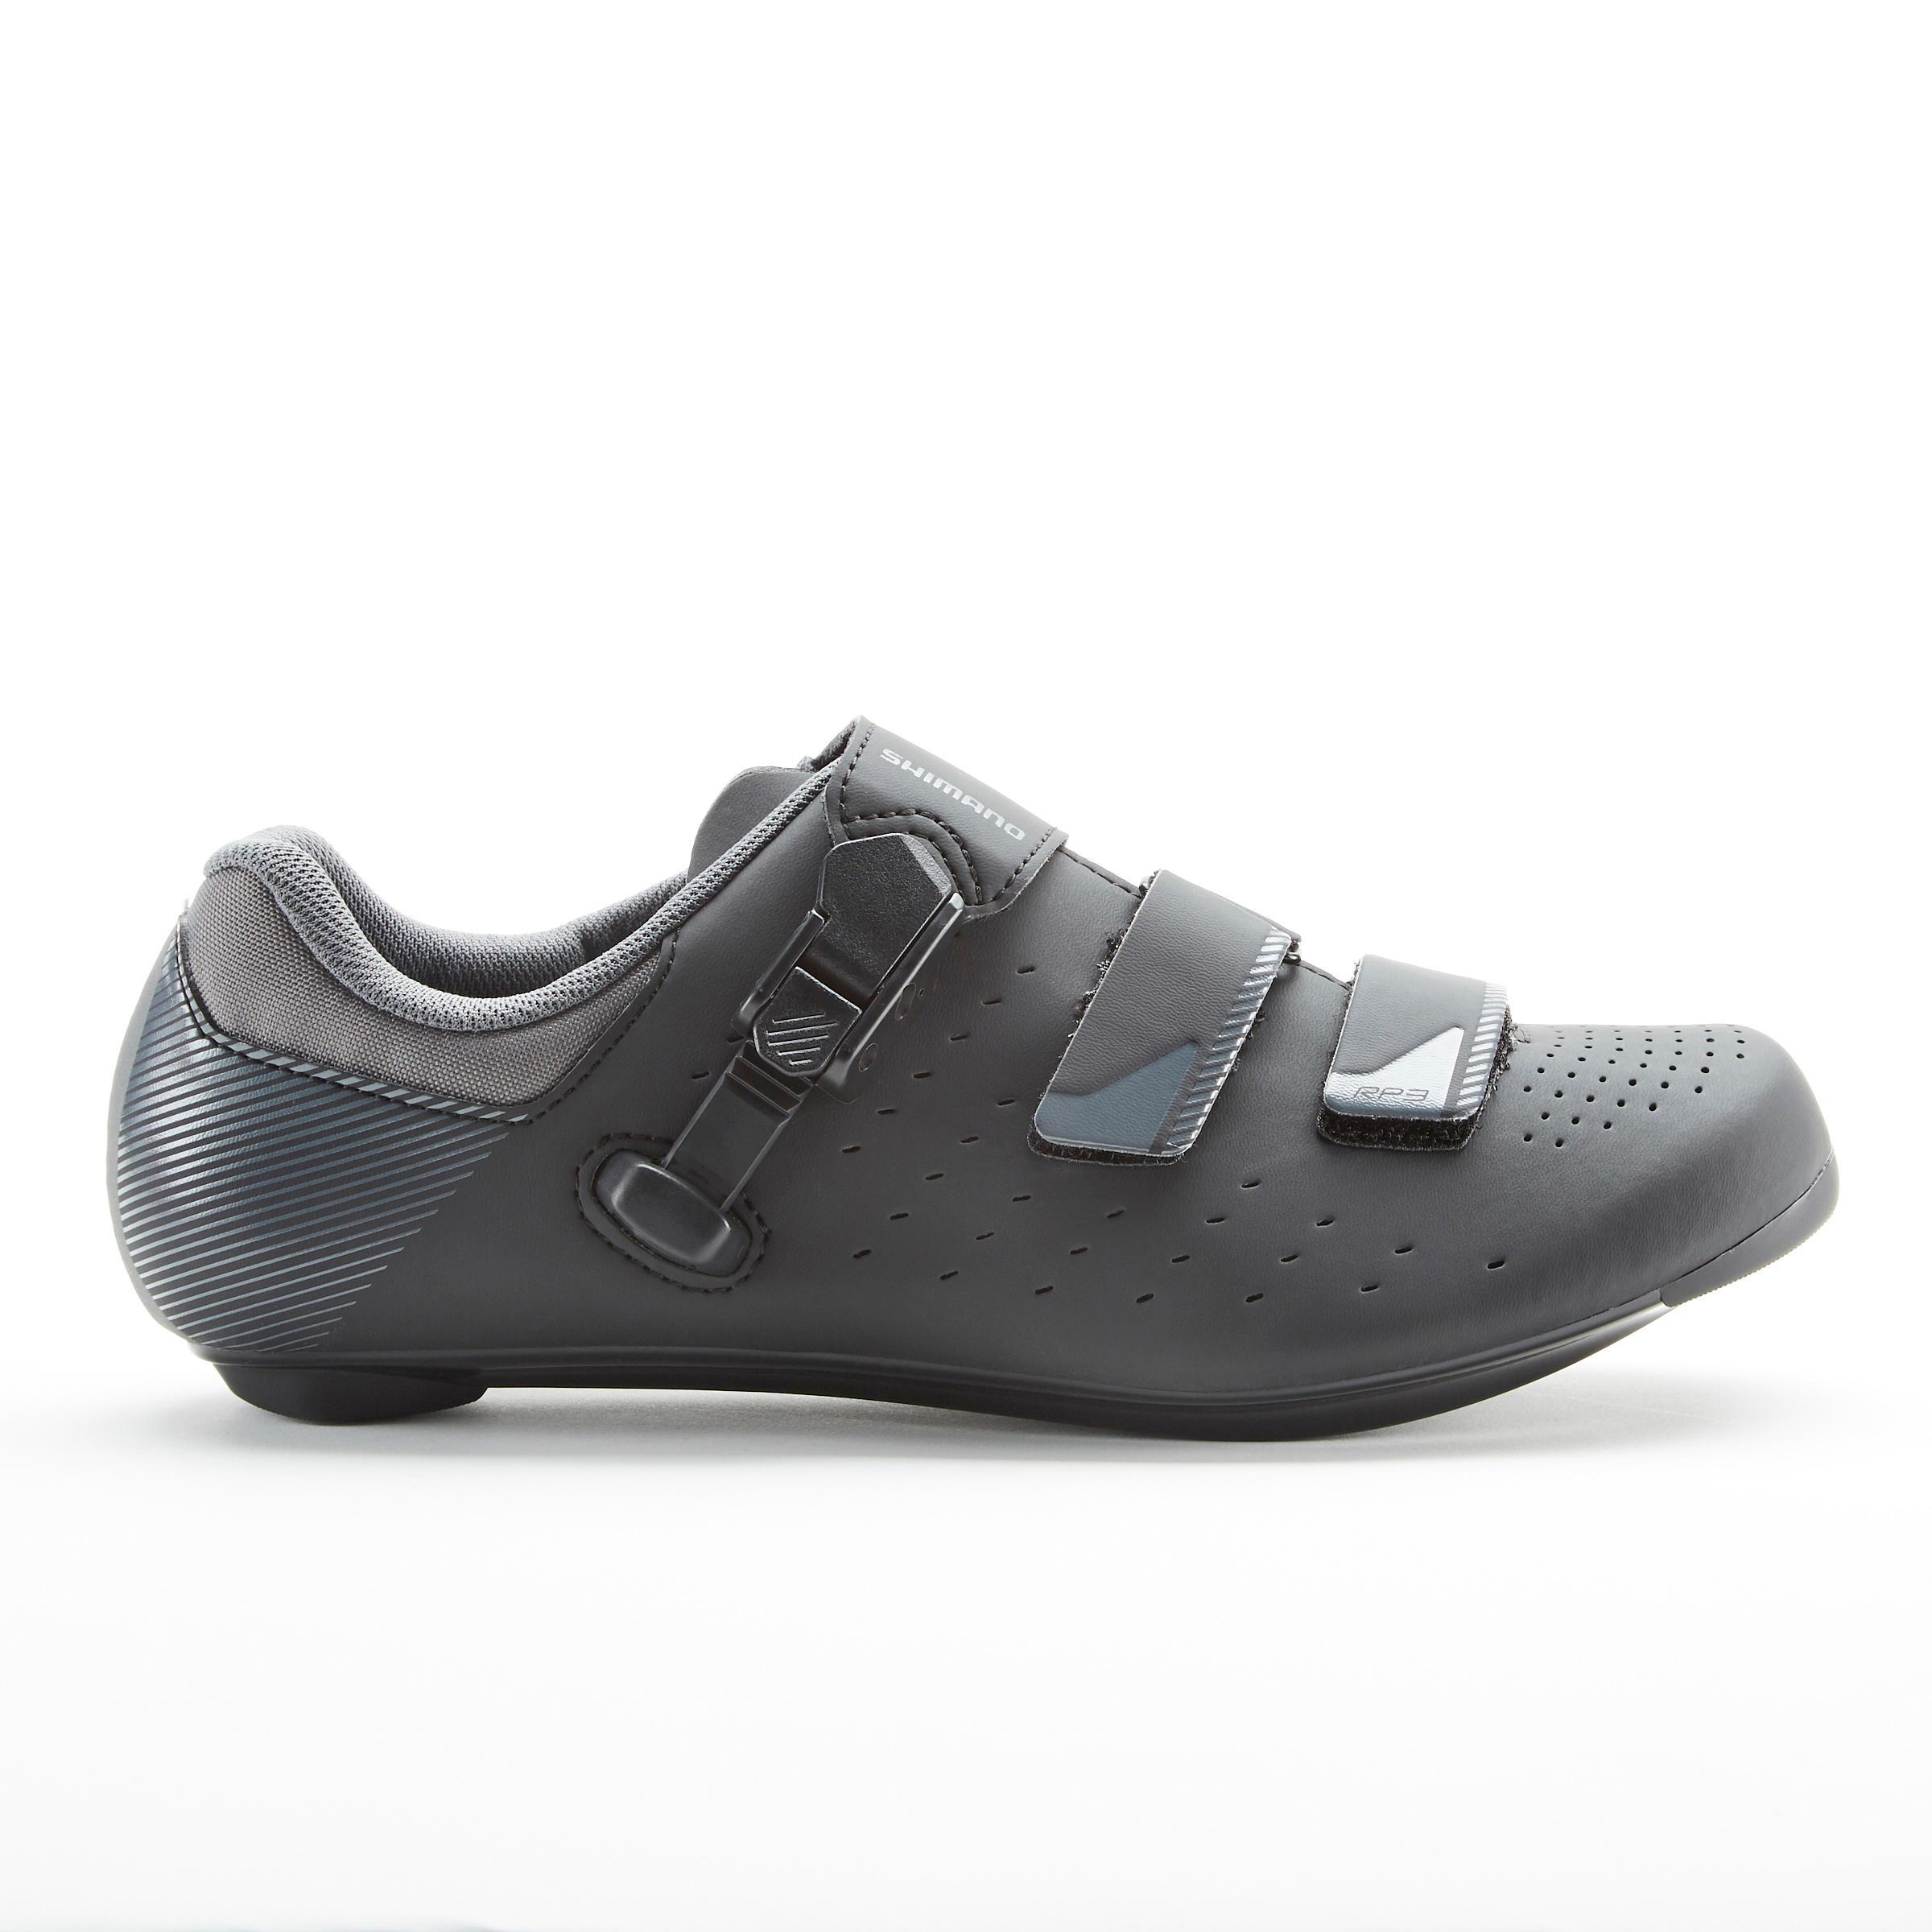 decathlon shimano shoes Shop Clothing